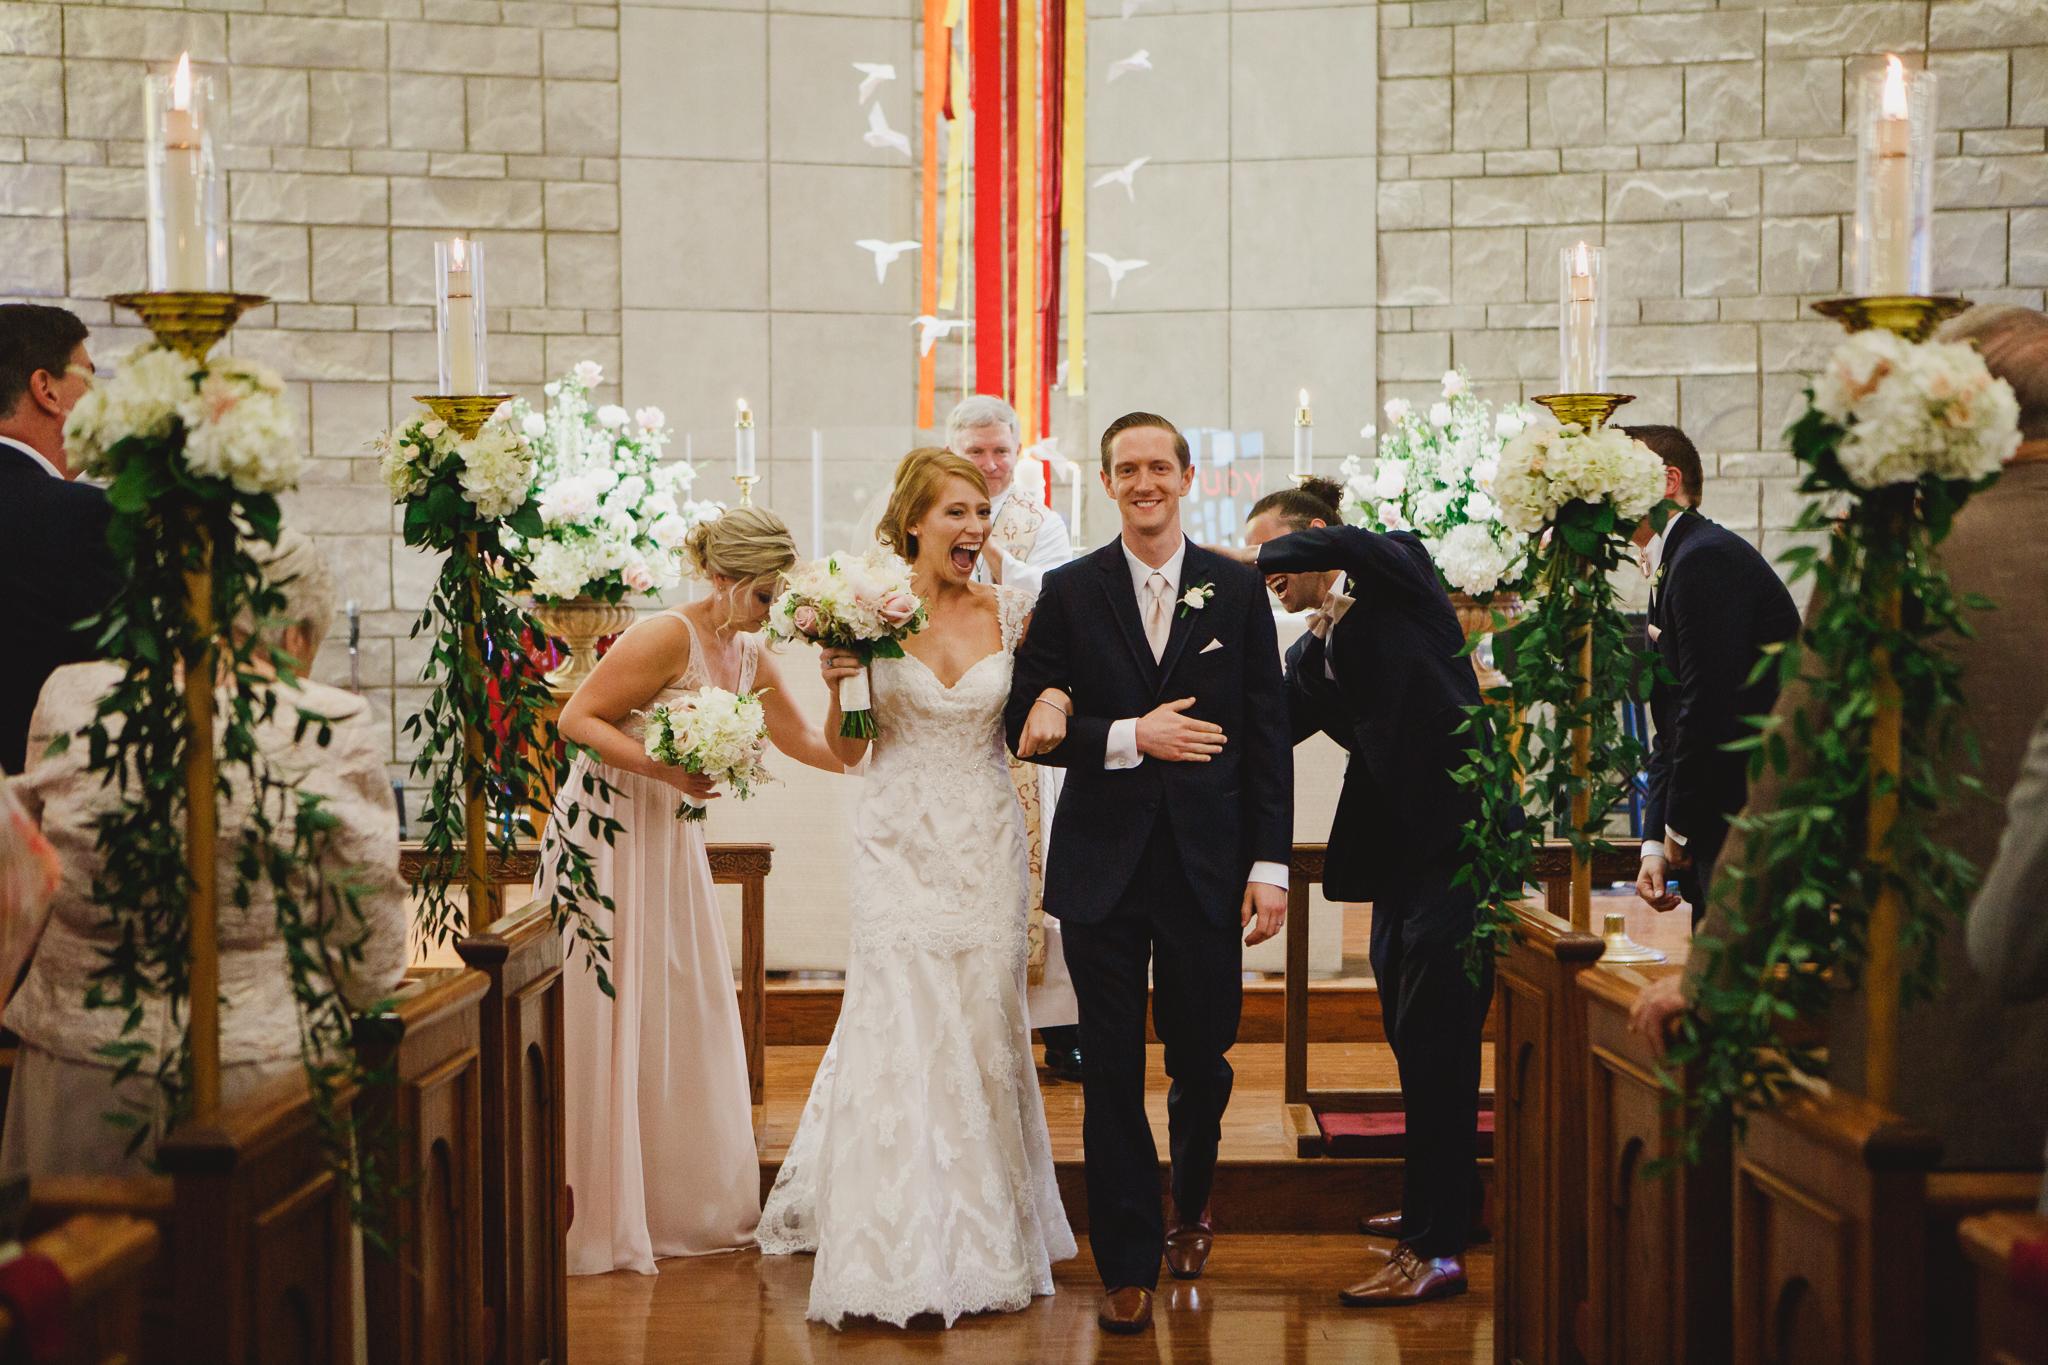 Michael and Kelly - the ashton depot - wedding DFW - wedding photographer- elizalde photography (55 of 150).jpg